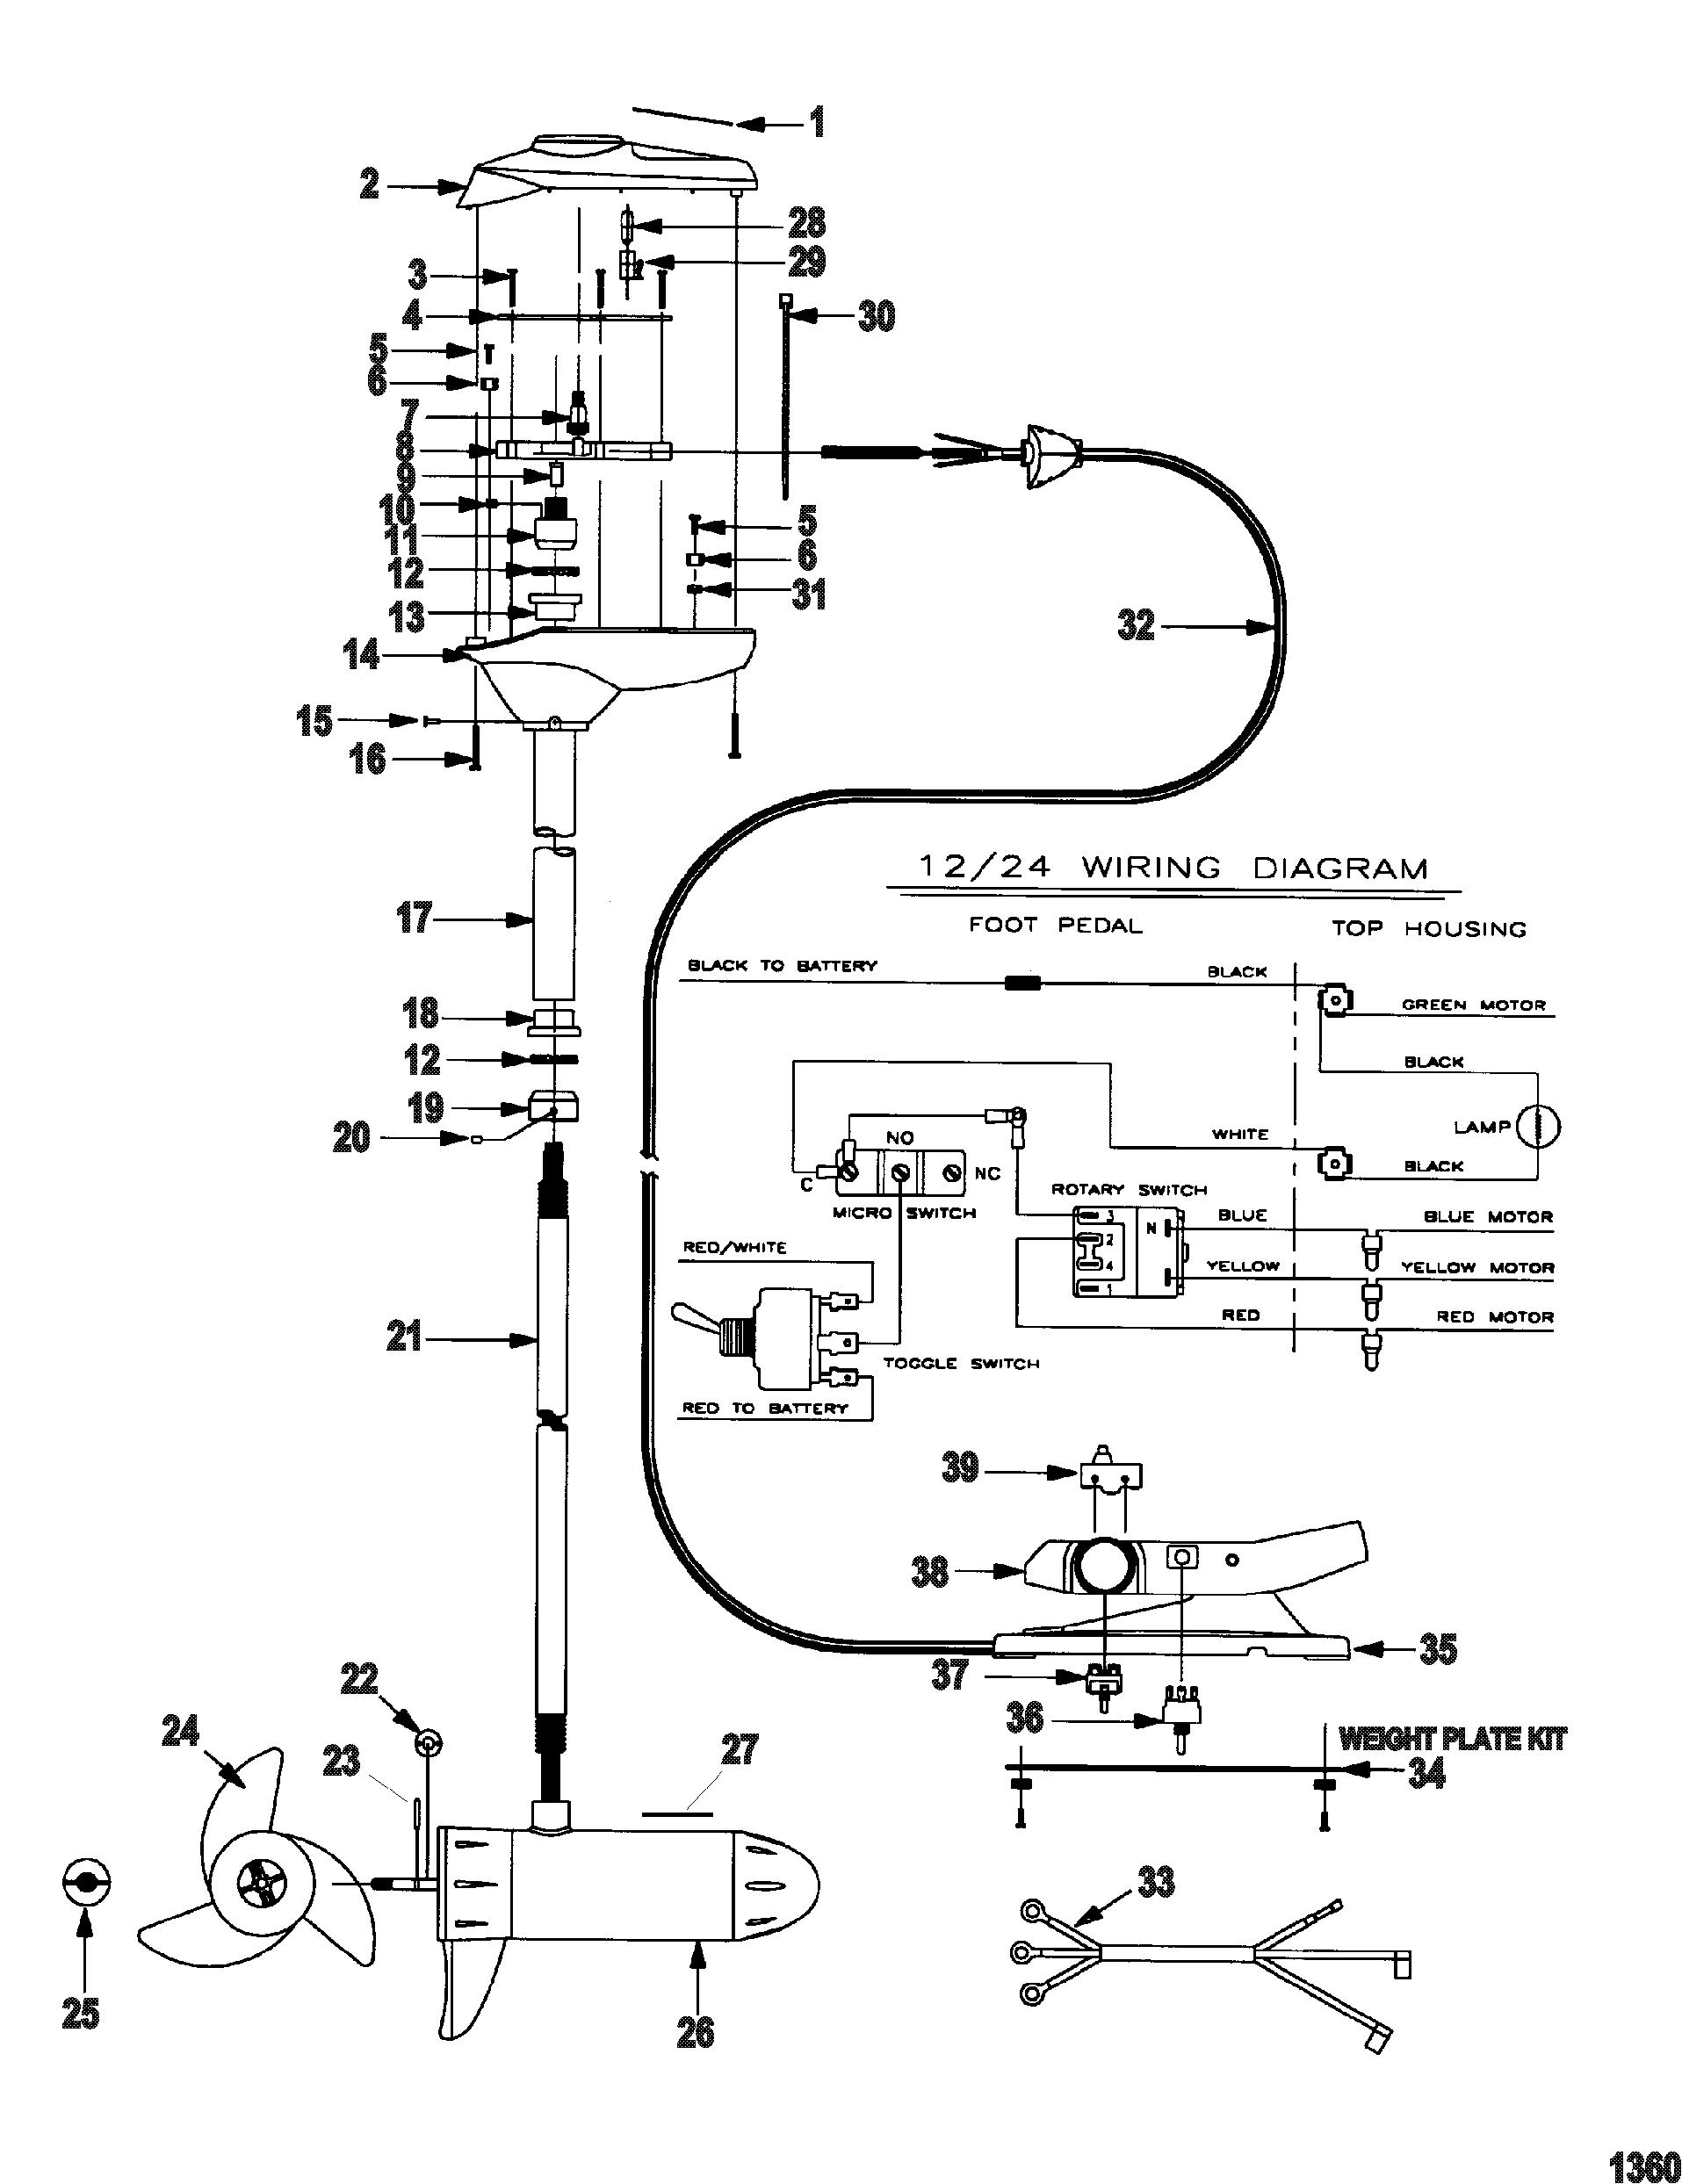 trolling motor wiring diagram 36 volt